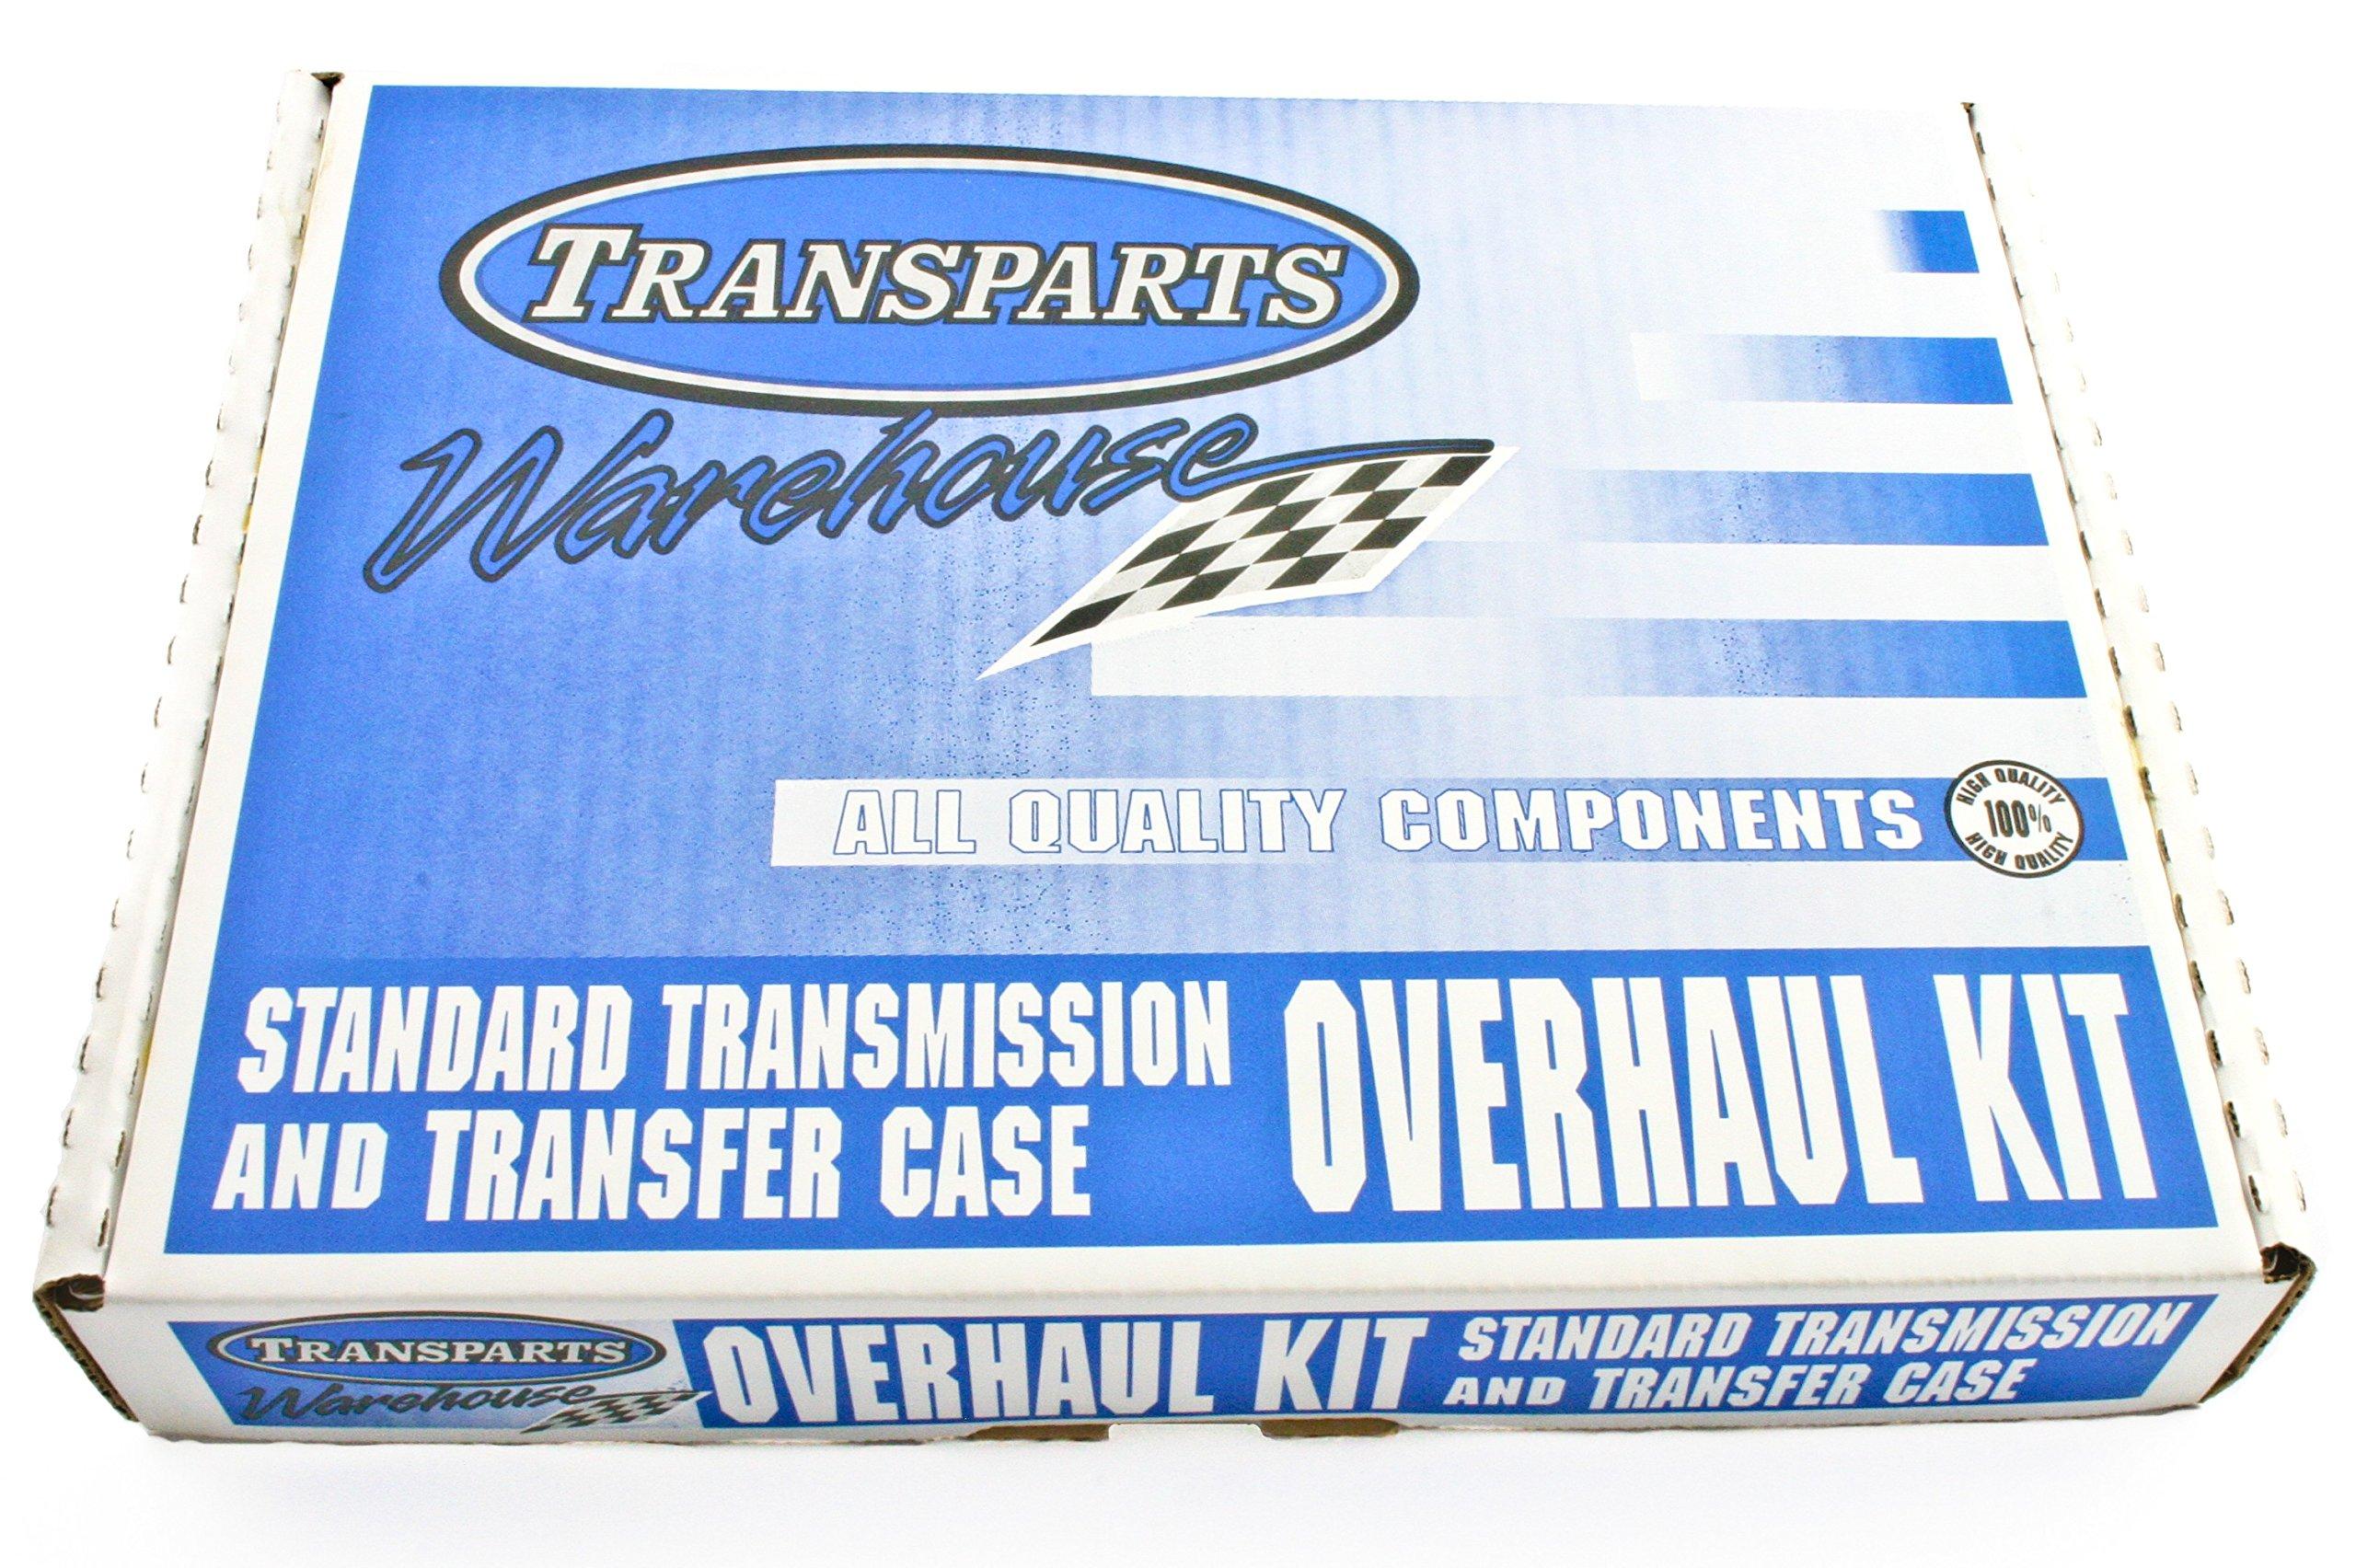 Transparts Warehouse BK124JWS Jeep SR4 4 Speed Transmission Kit with rings